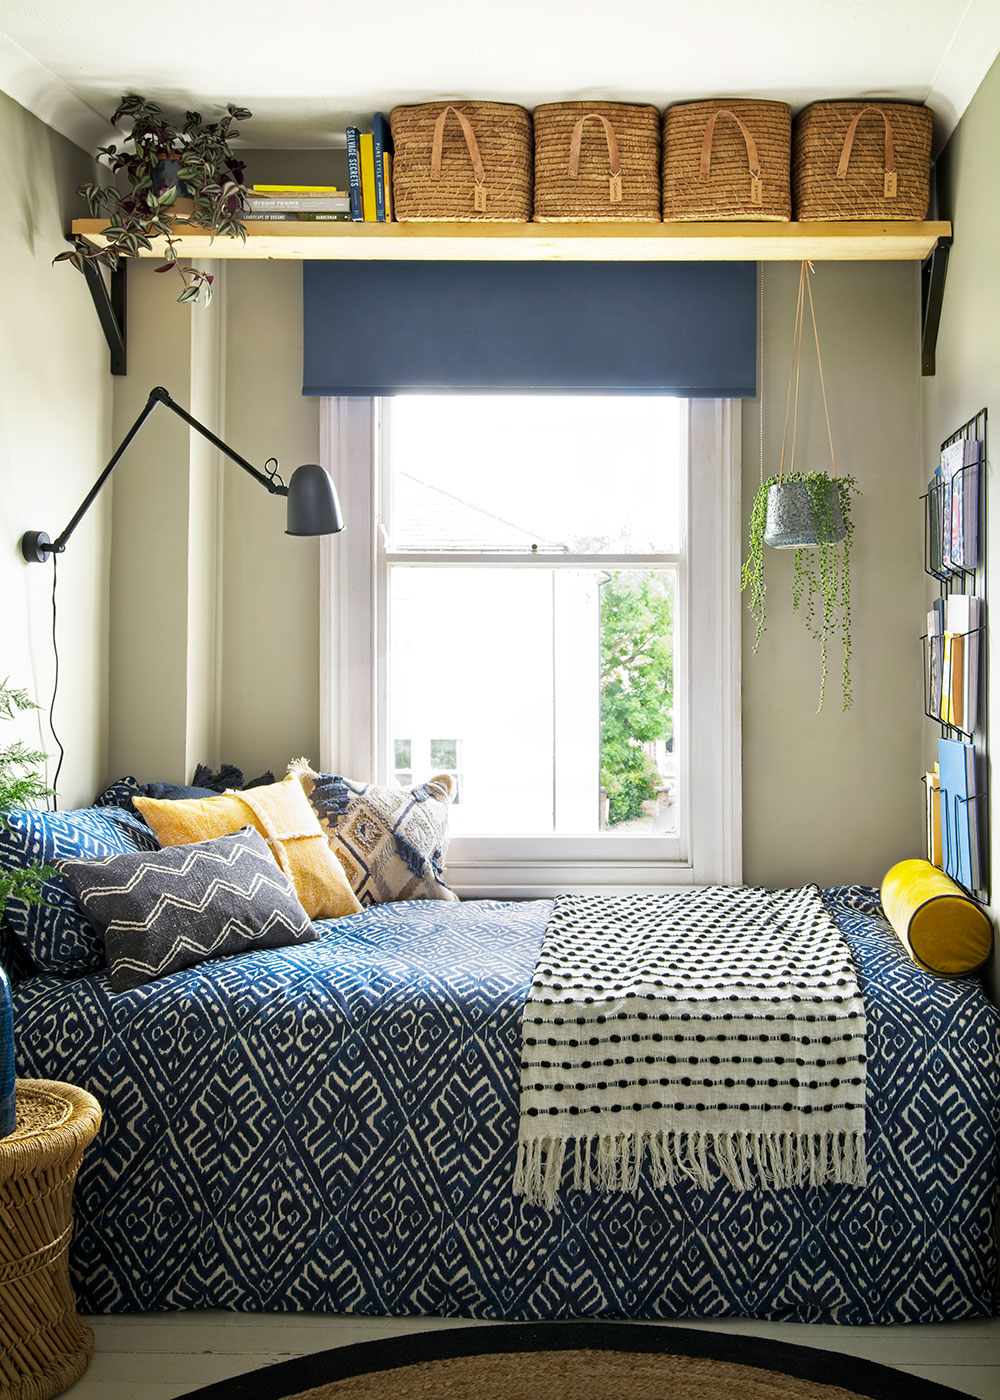 Desain kamar tidur sederhana_5